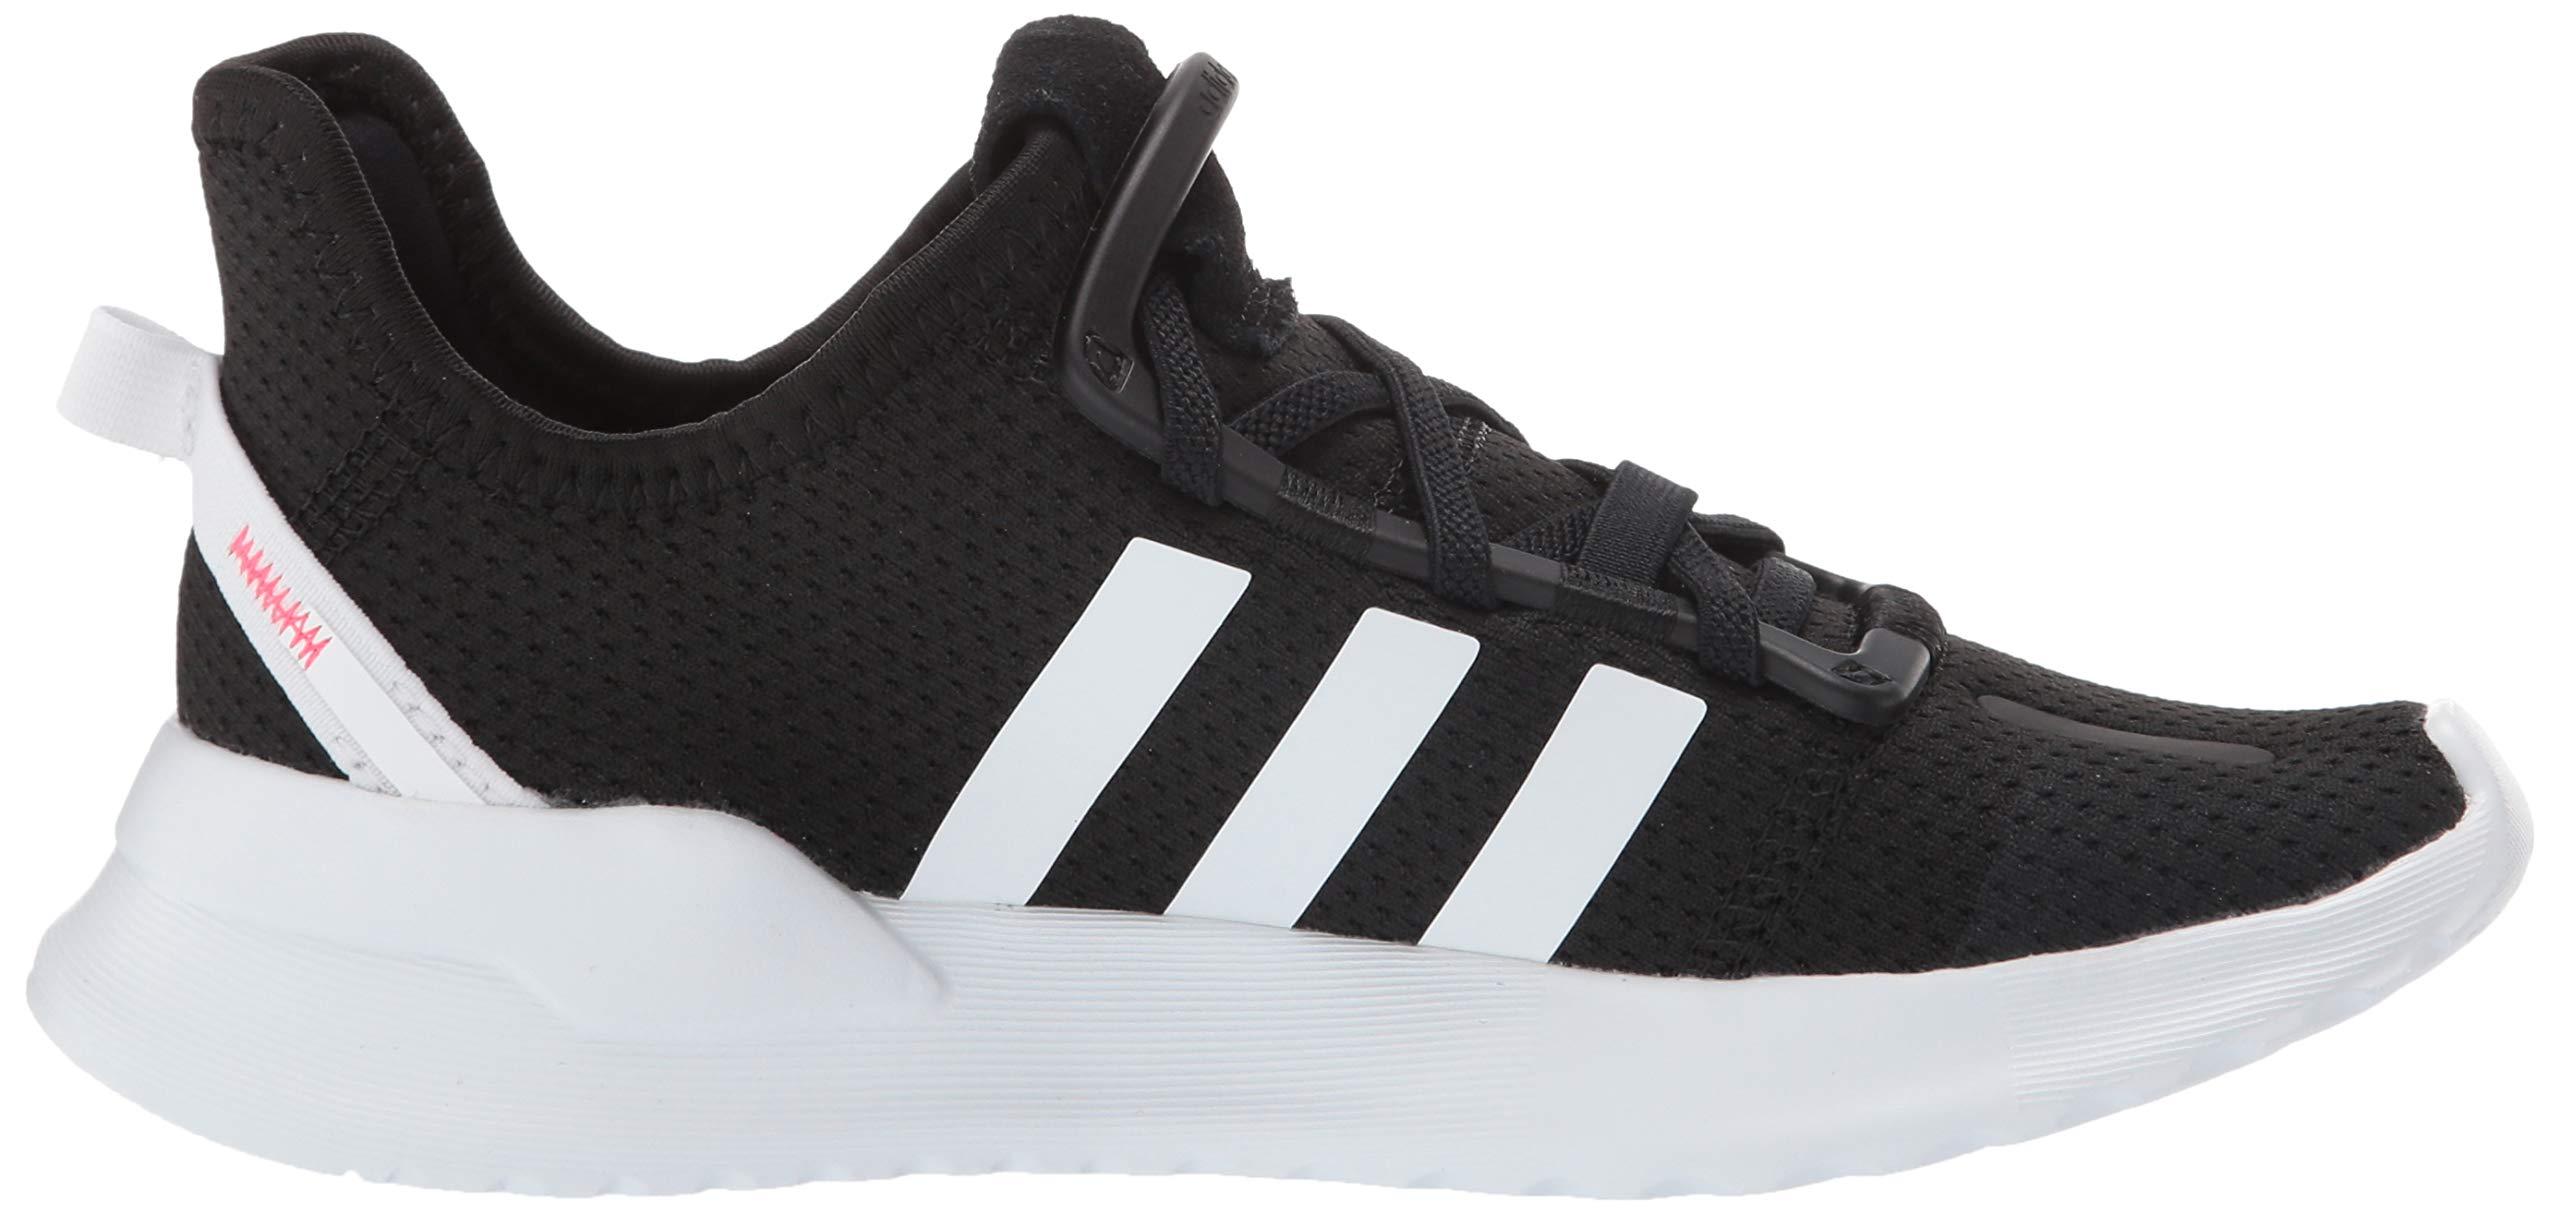 adidas Originals Baby U_Path Running Shoe Black/White/Shock red 6K M US Toddler by adidas Originals (Image #7)